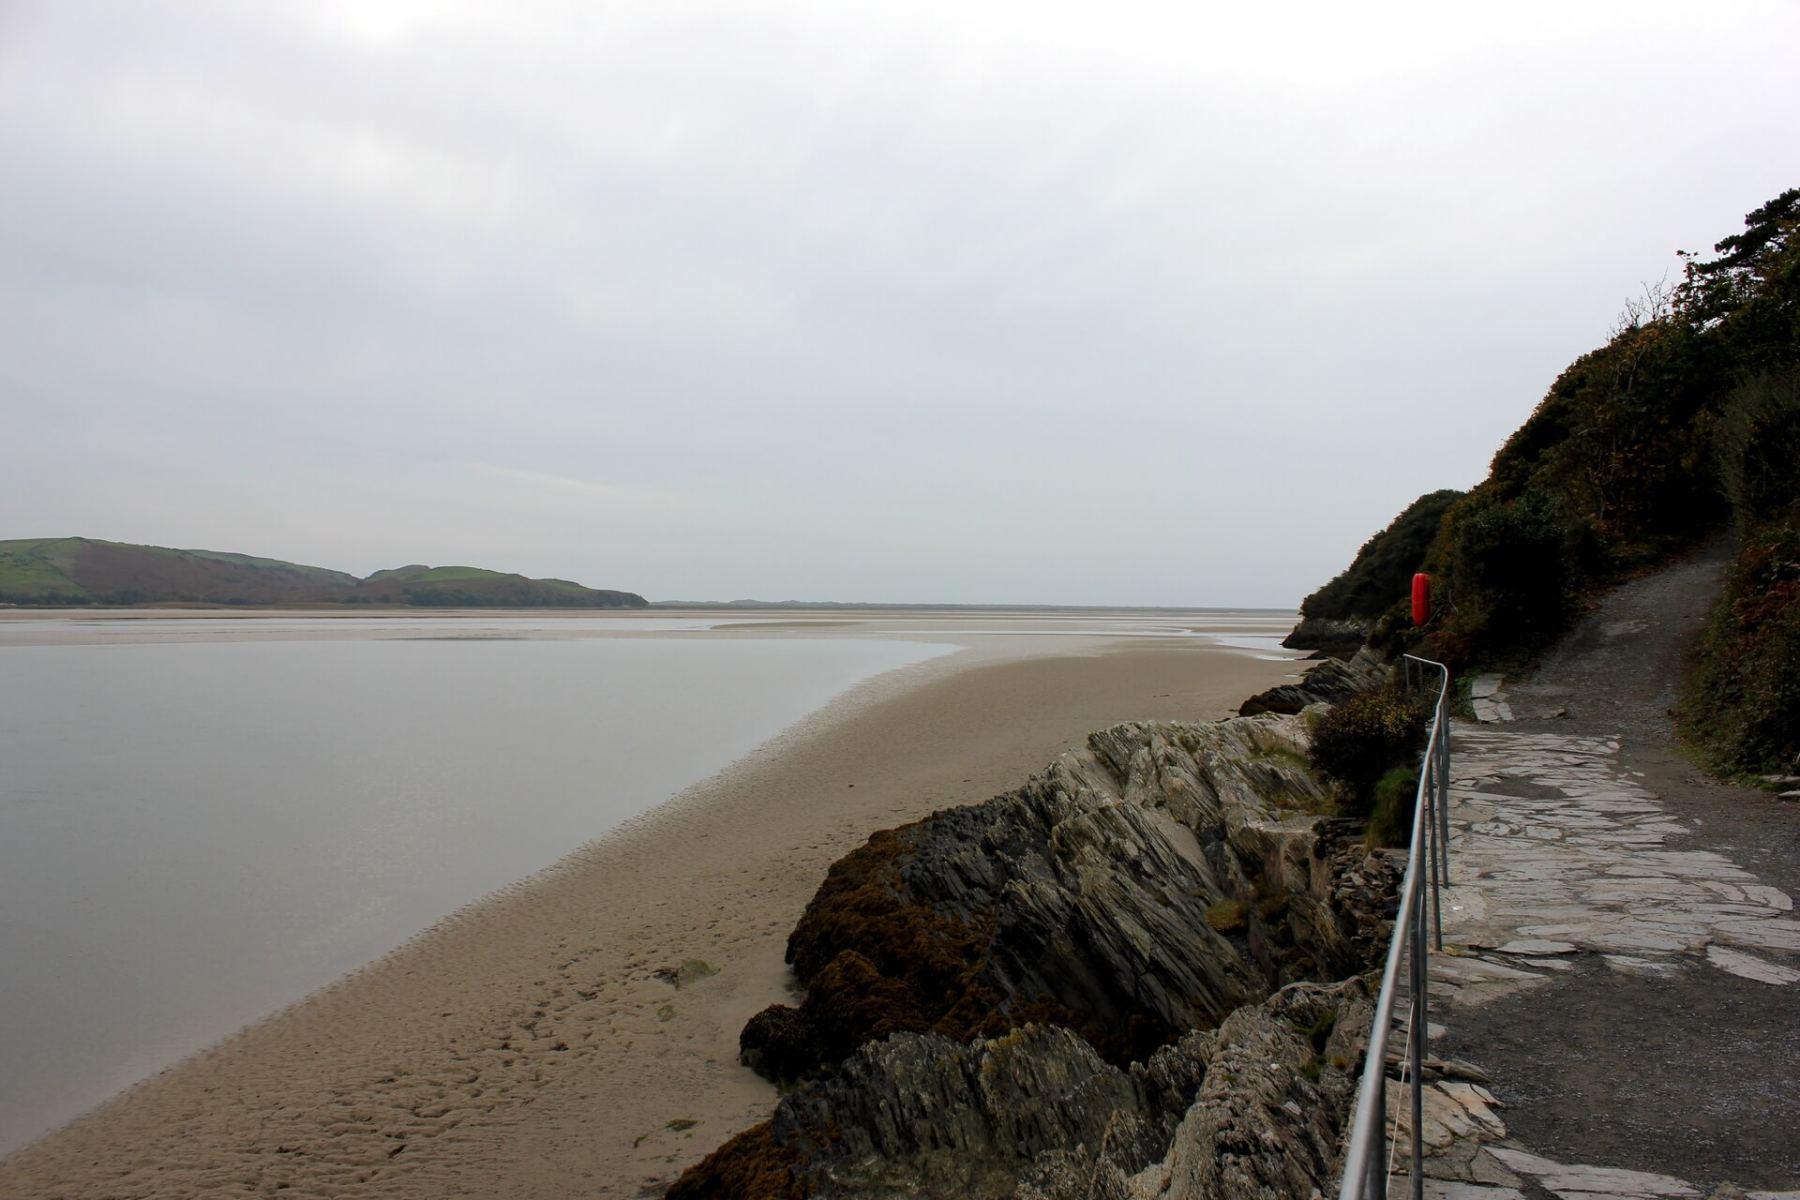 portmeirion-estuary-view-coastal-path